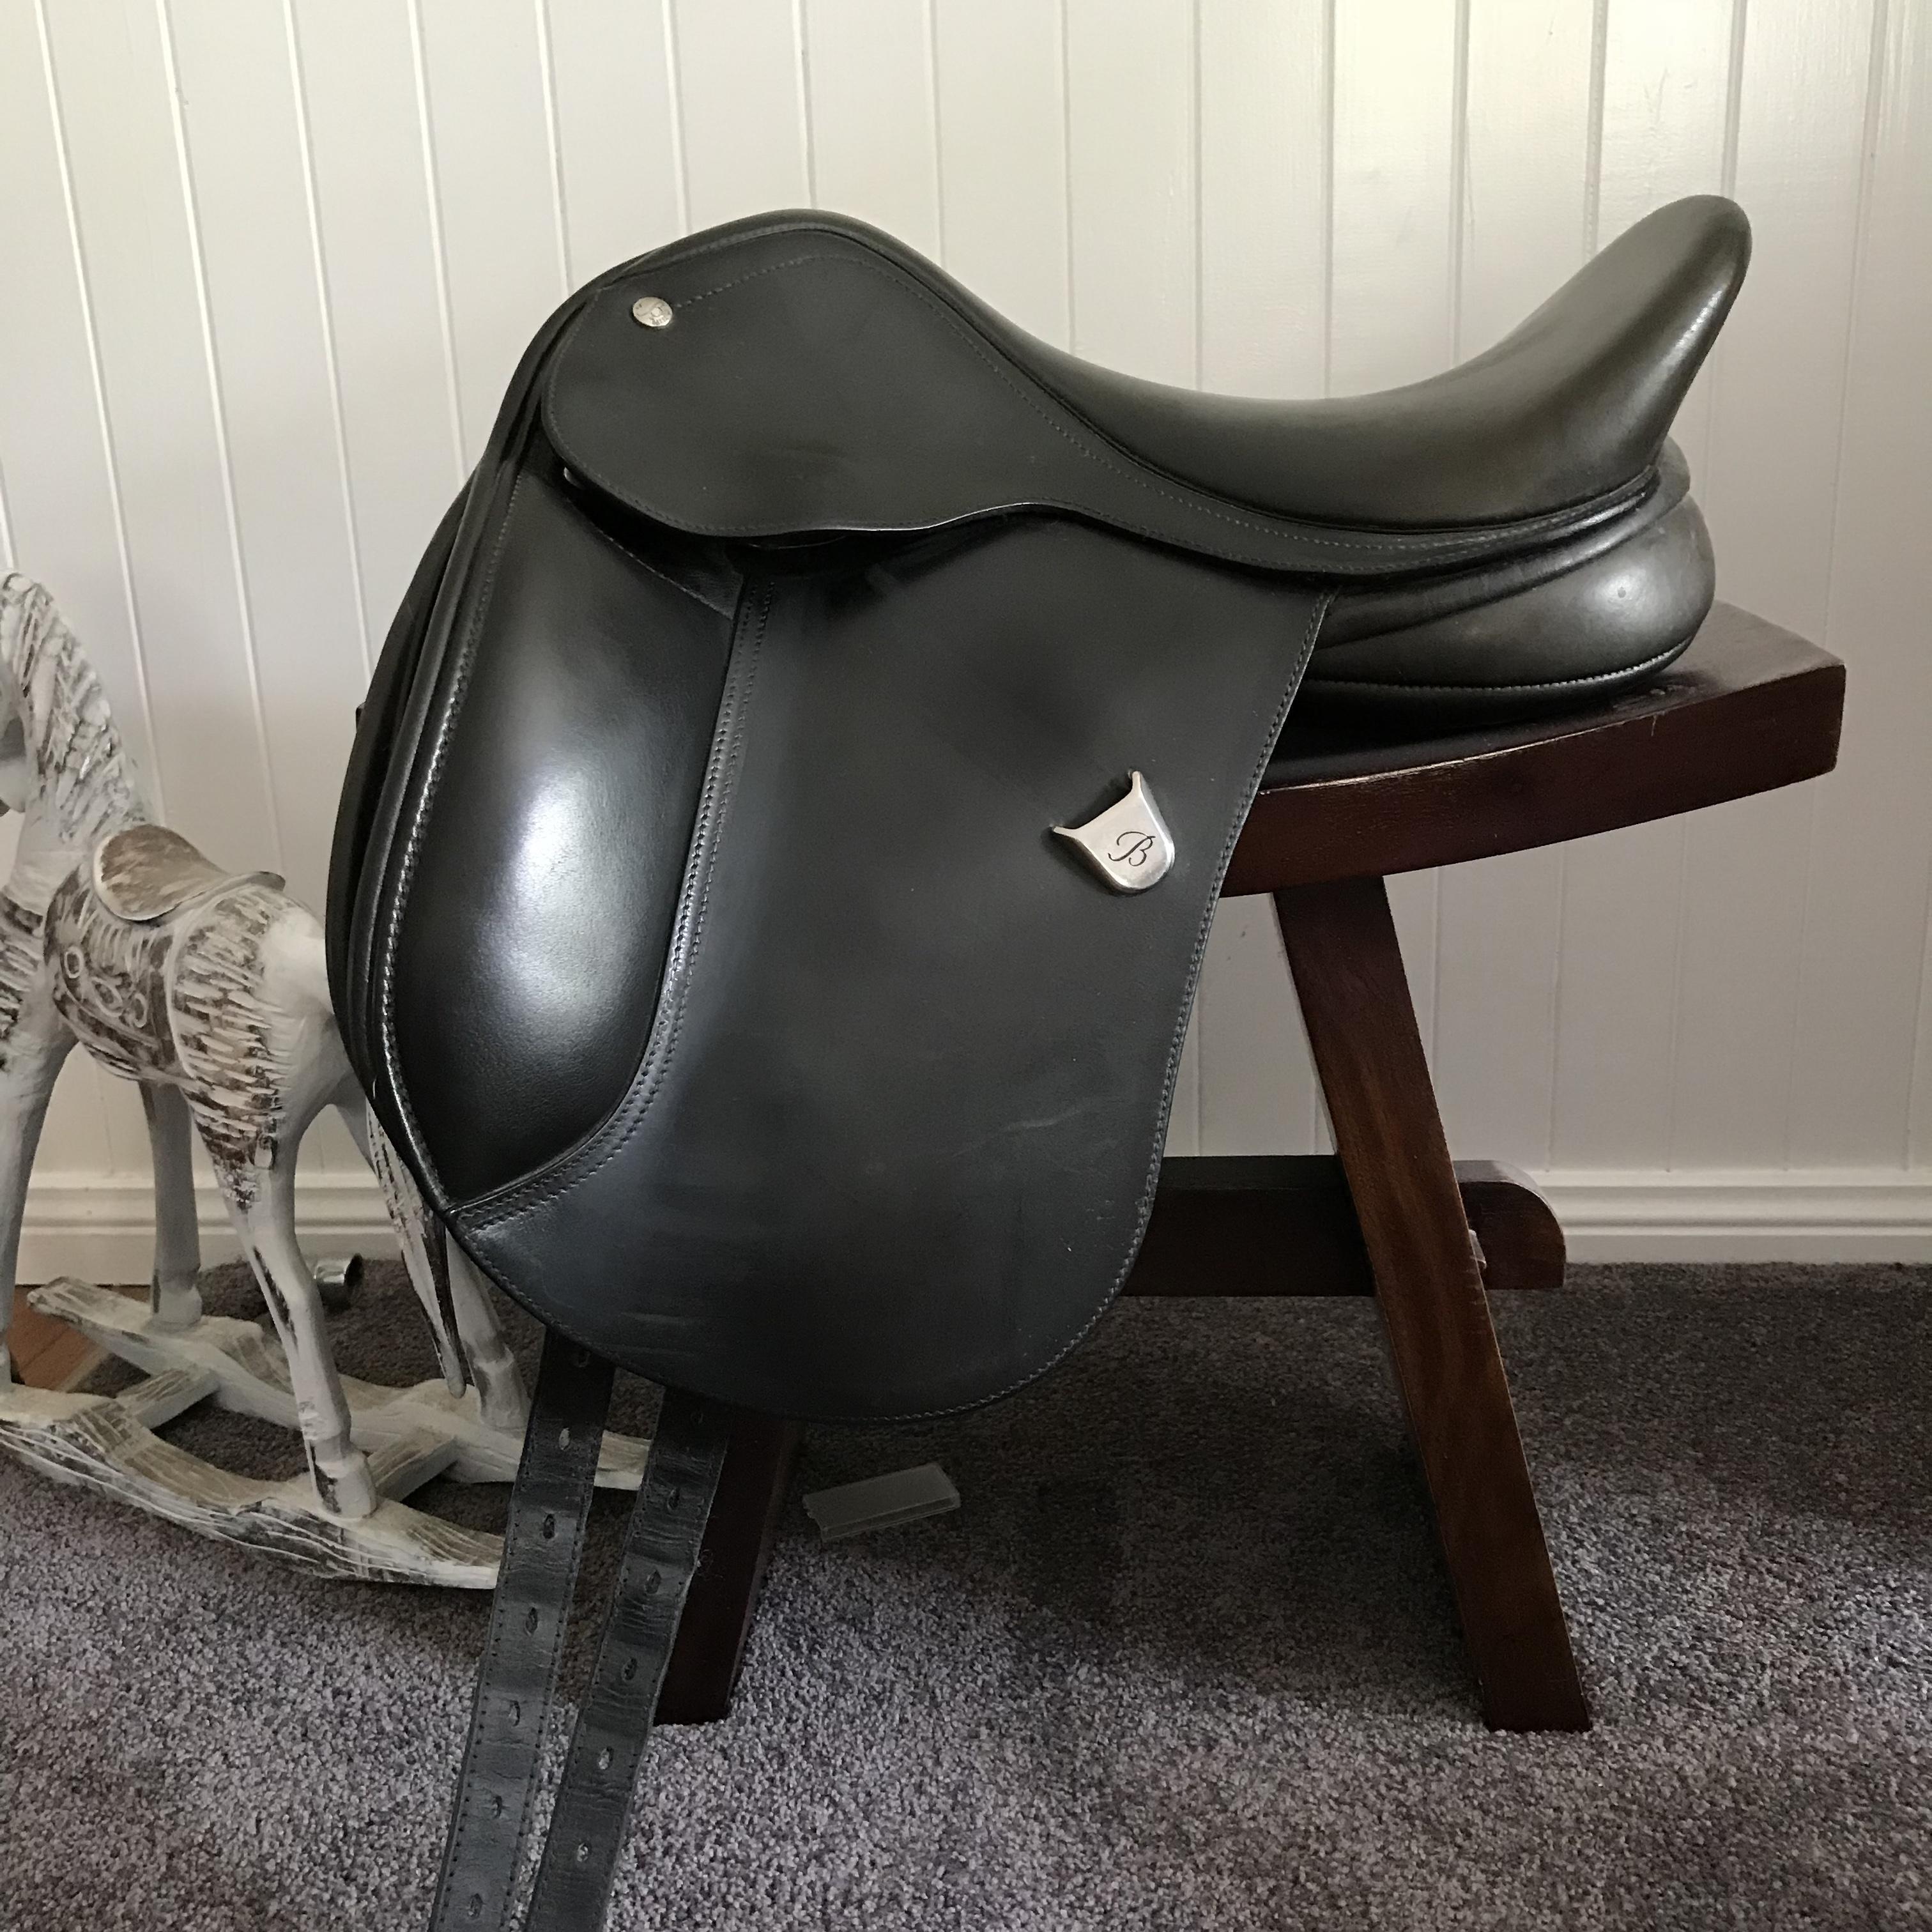 Bates pony dressage